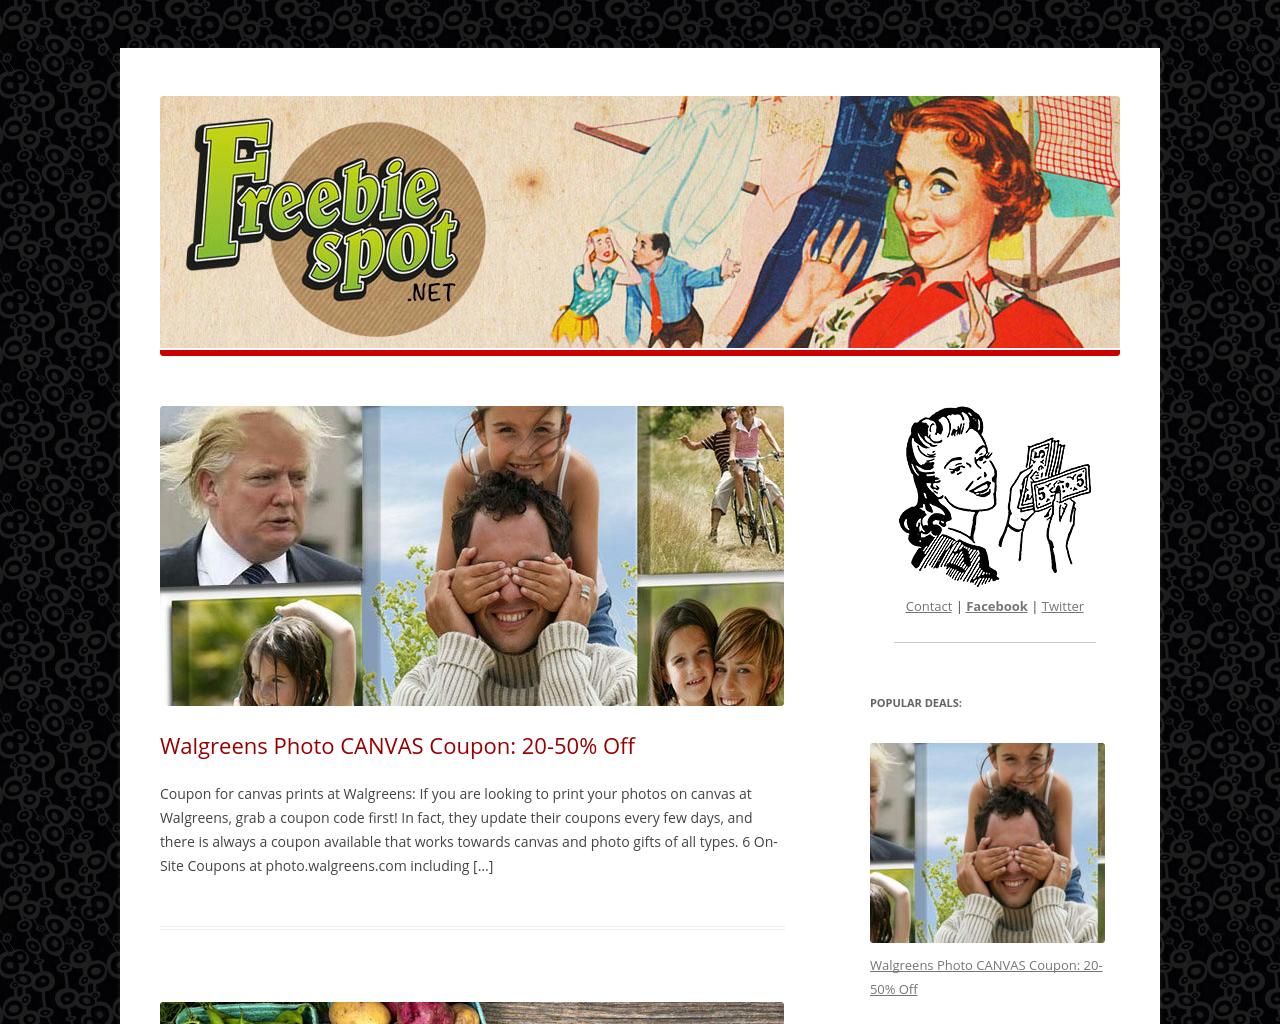 Freebie-Spot-Advertising-Reviews-Pricing